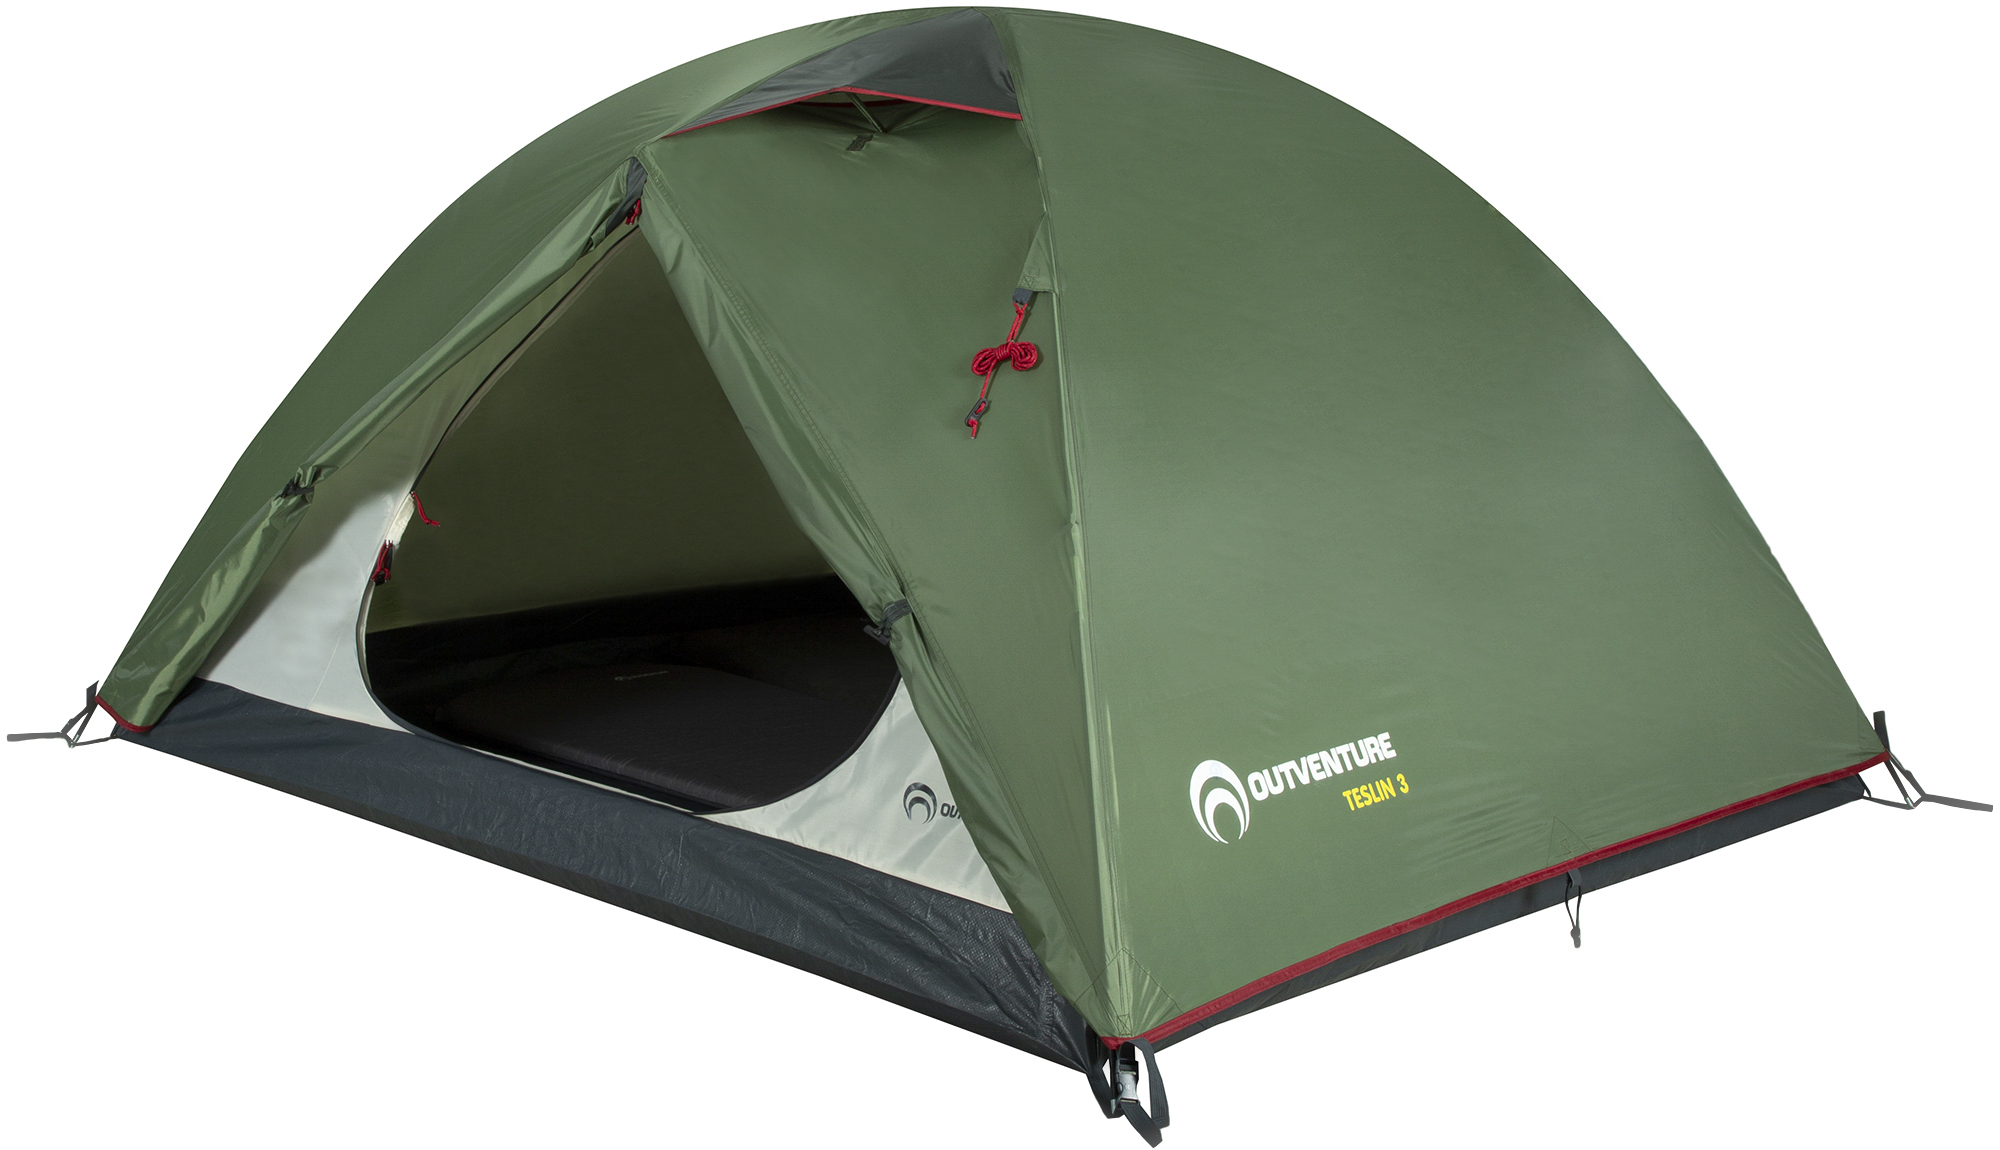 Outventure Teslin 3 палатка туристическая maverick ideal 400